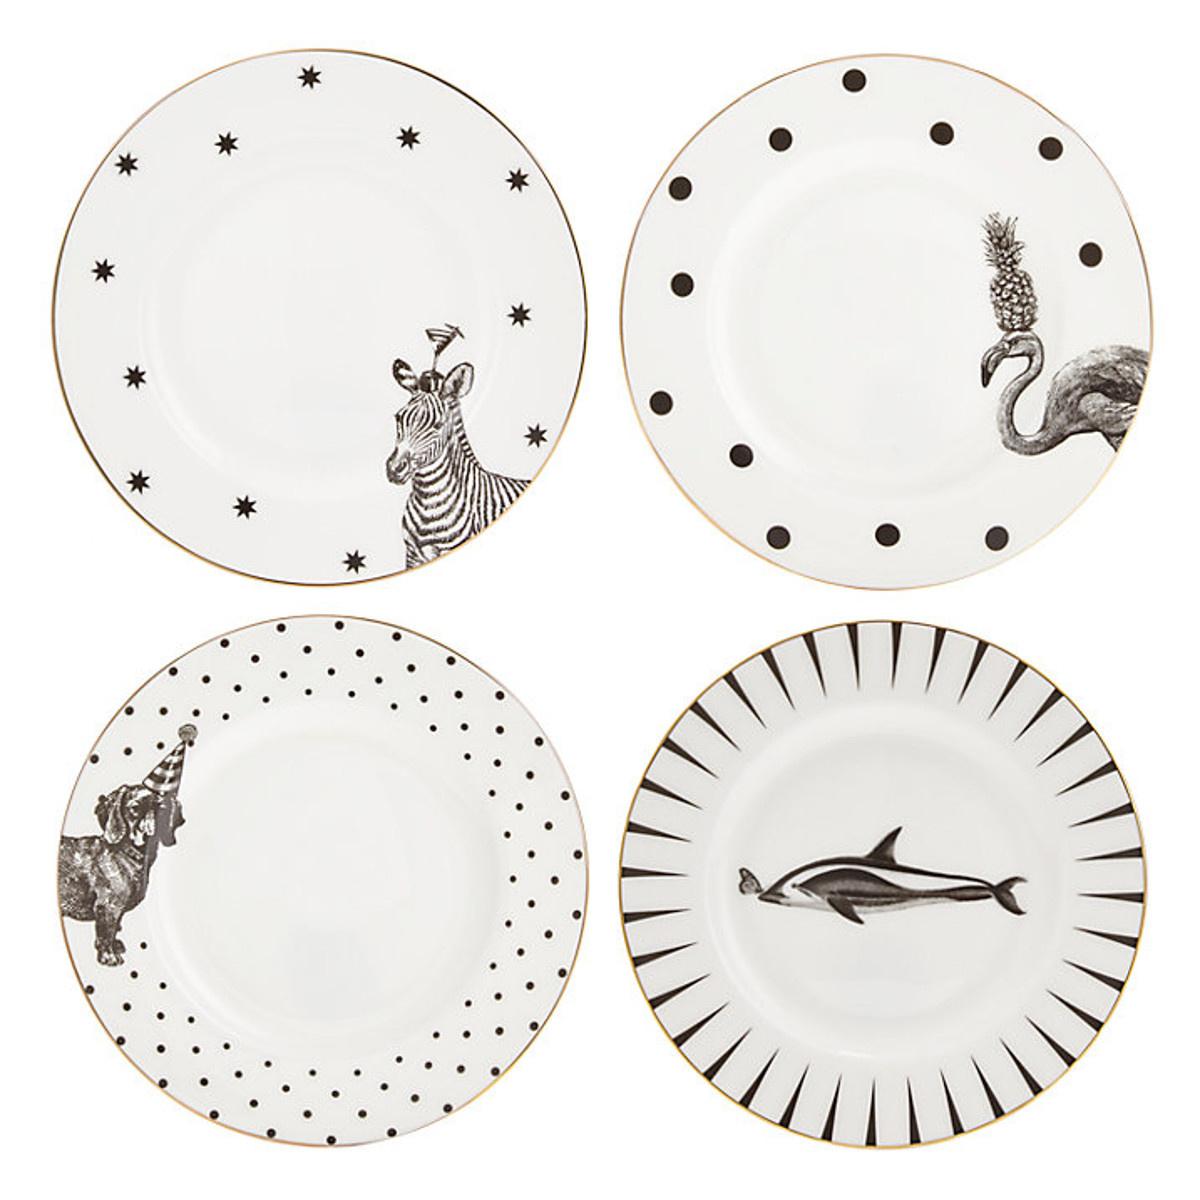 Yvonne Ellen Yvonne Ellen London Monochrome Set of 4 Plates Ø 16 cm - Animal Prints - Bone China - In Beautiful Giftbox